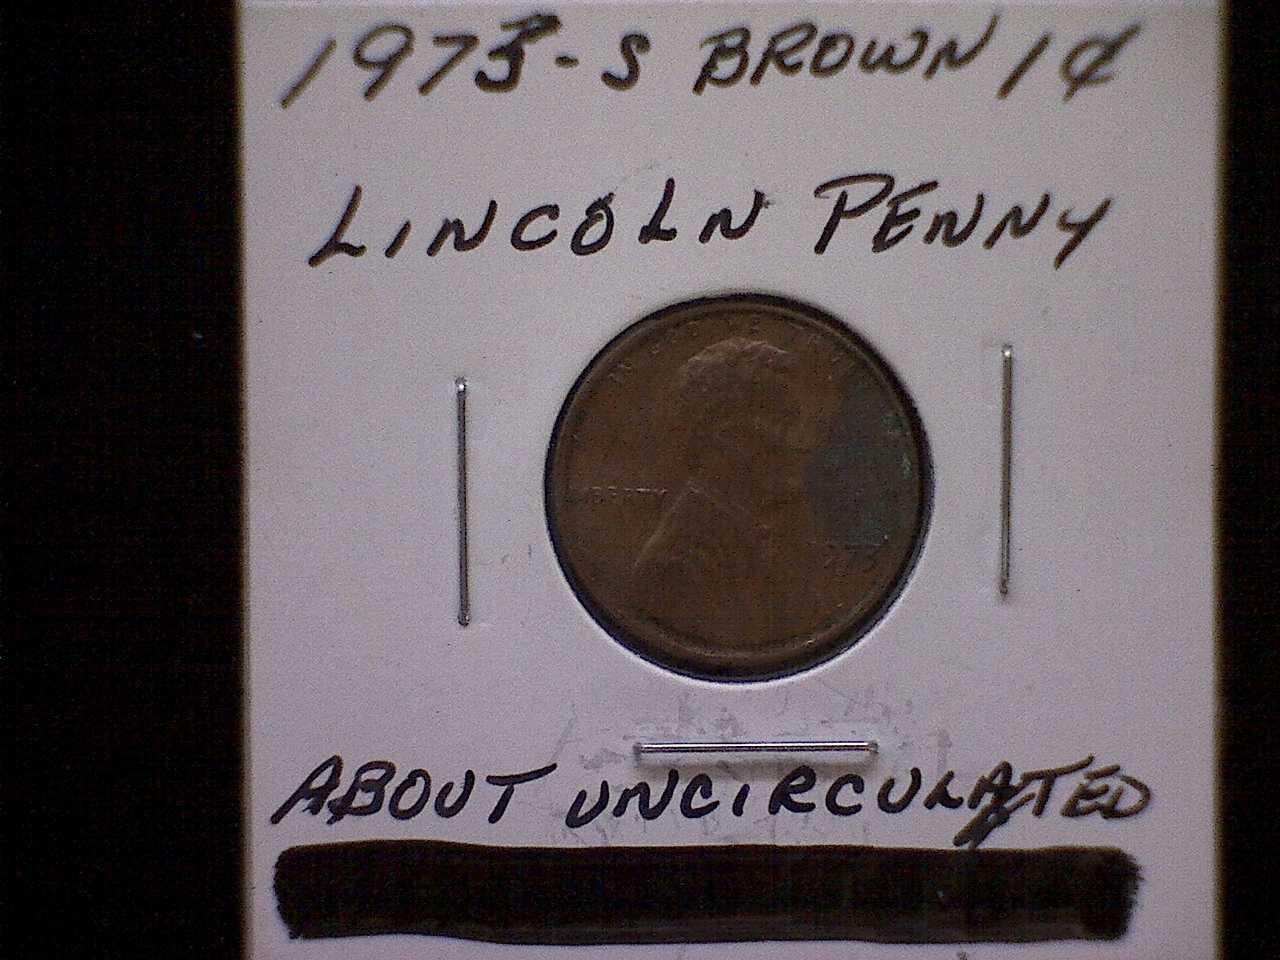 1973-S LINCOLN MEMORIAL PENNY